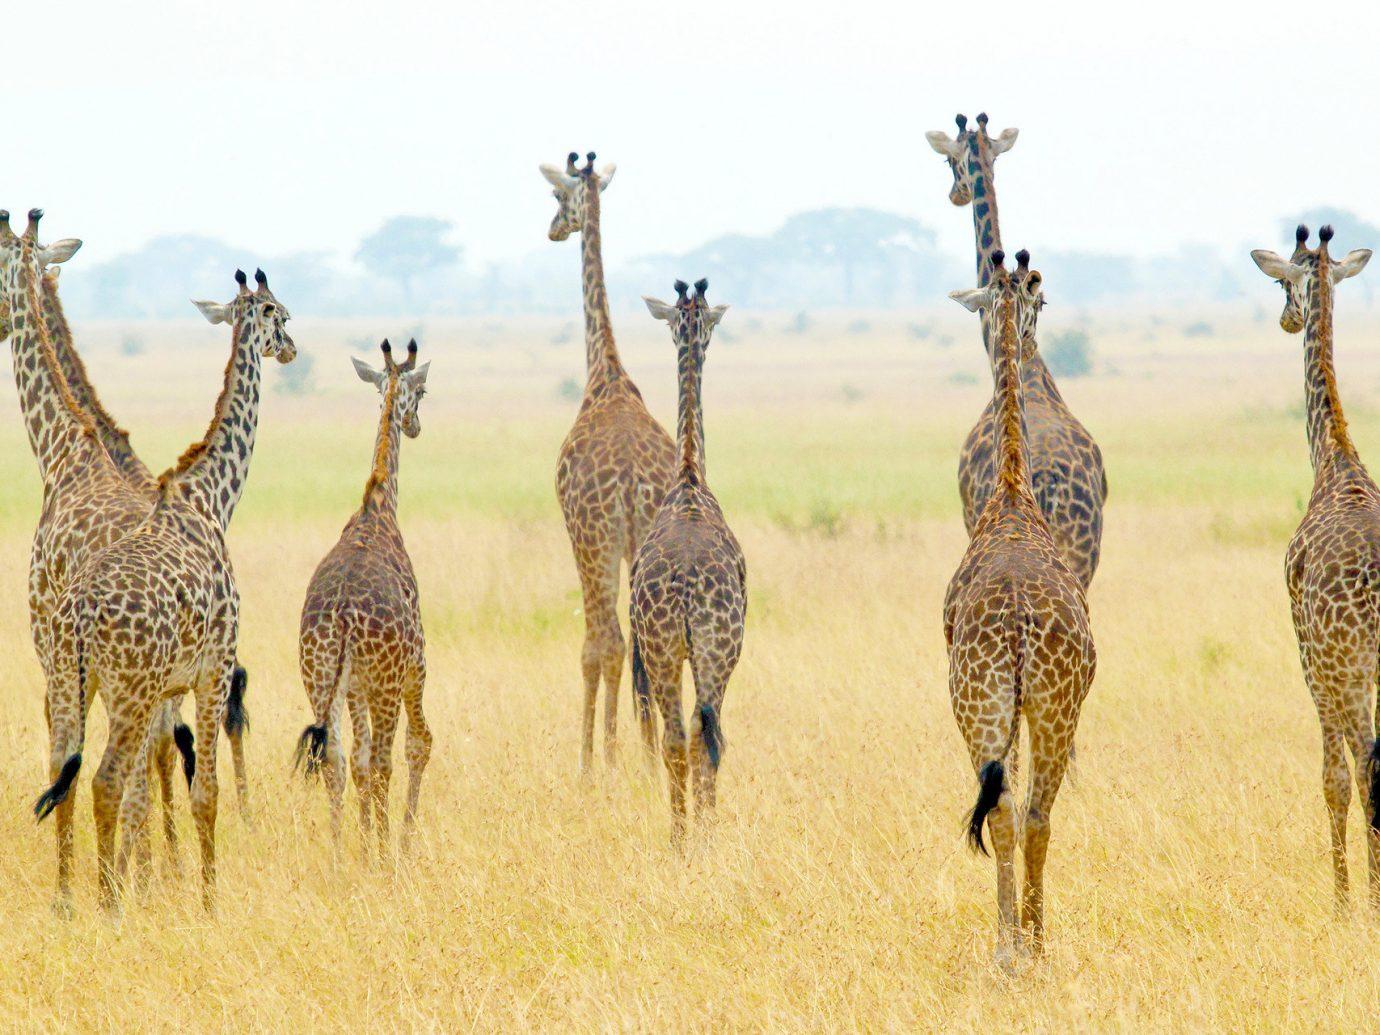 Hotels Luxury Travel grass outdoor field herd animal giraffe mammal vertebrate savanna group Wildlife fauna giraffidae Safari grassland grassy prairie